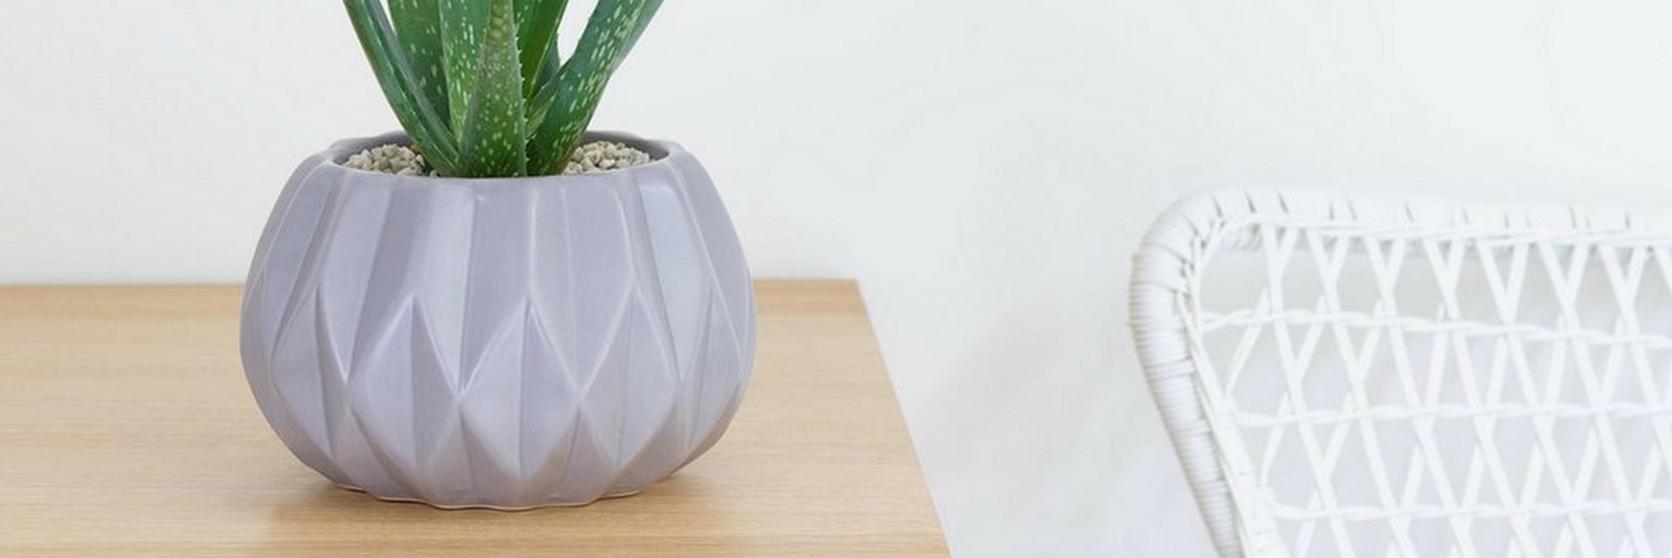 aloe-vera-succulent-plant